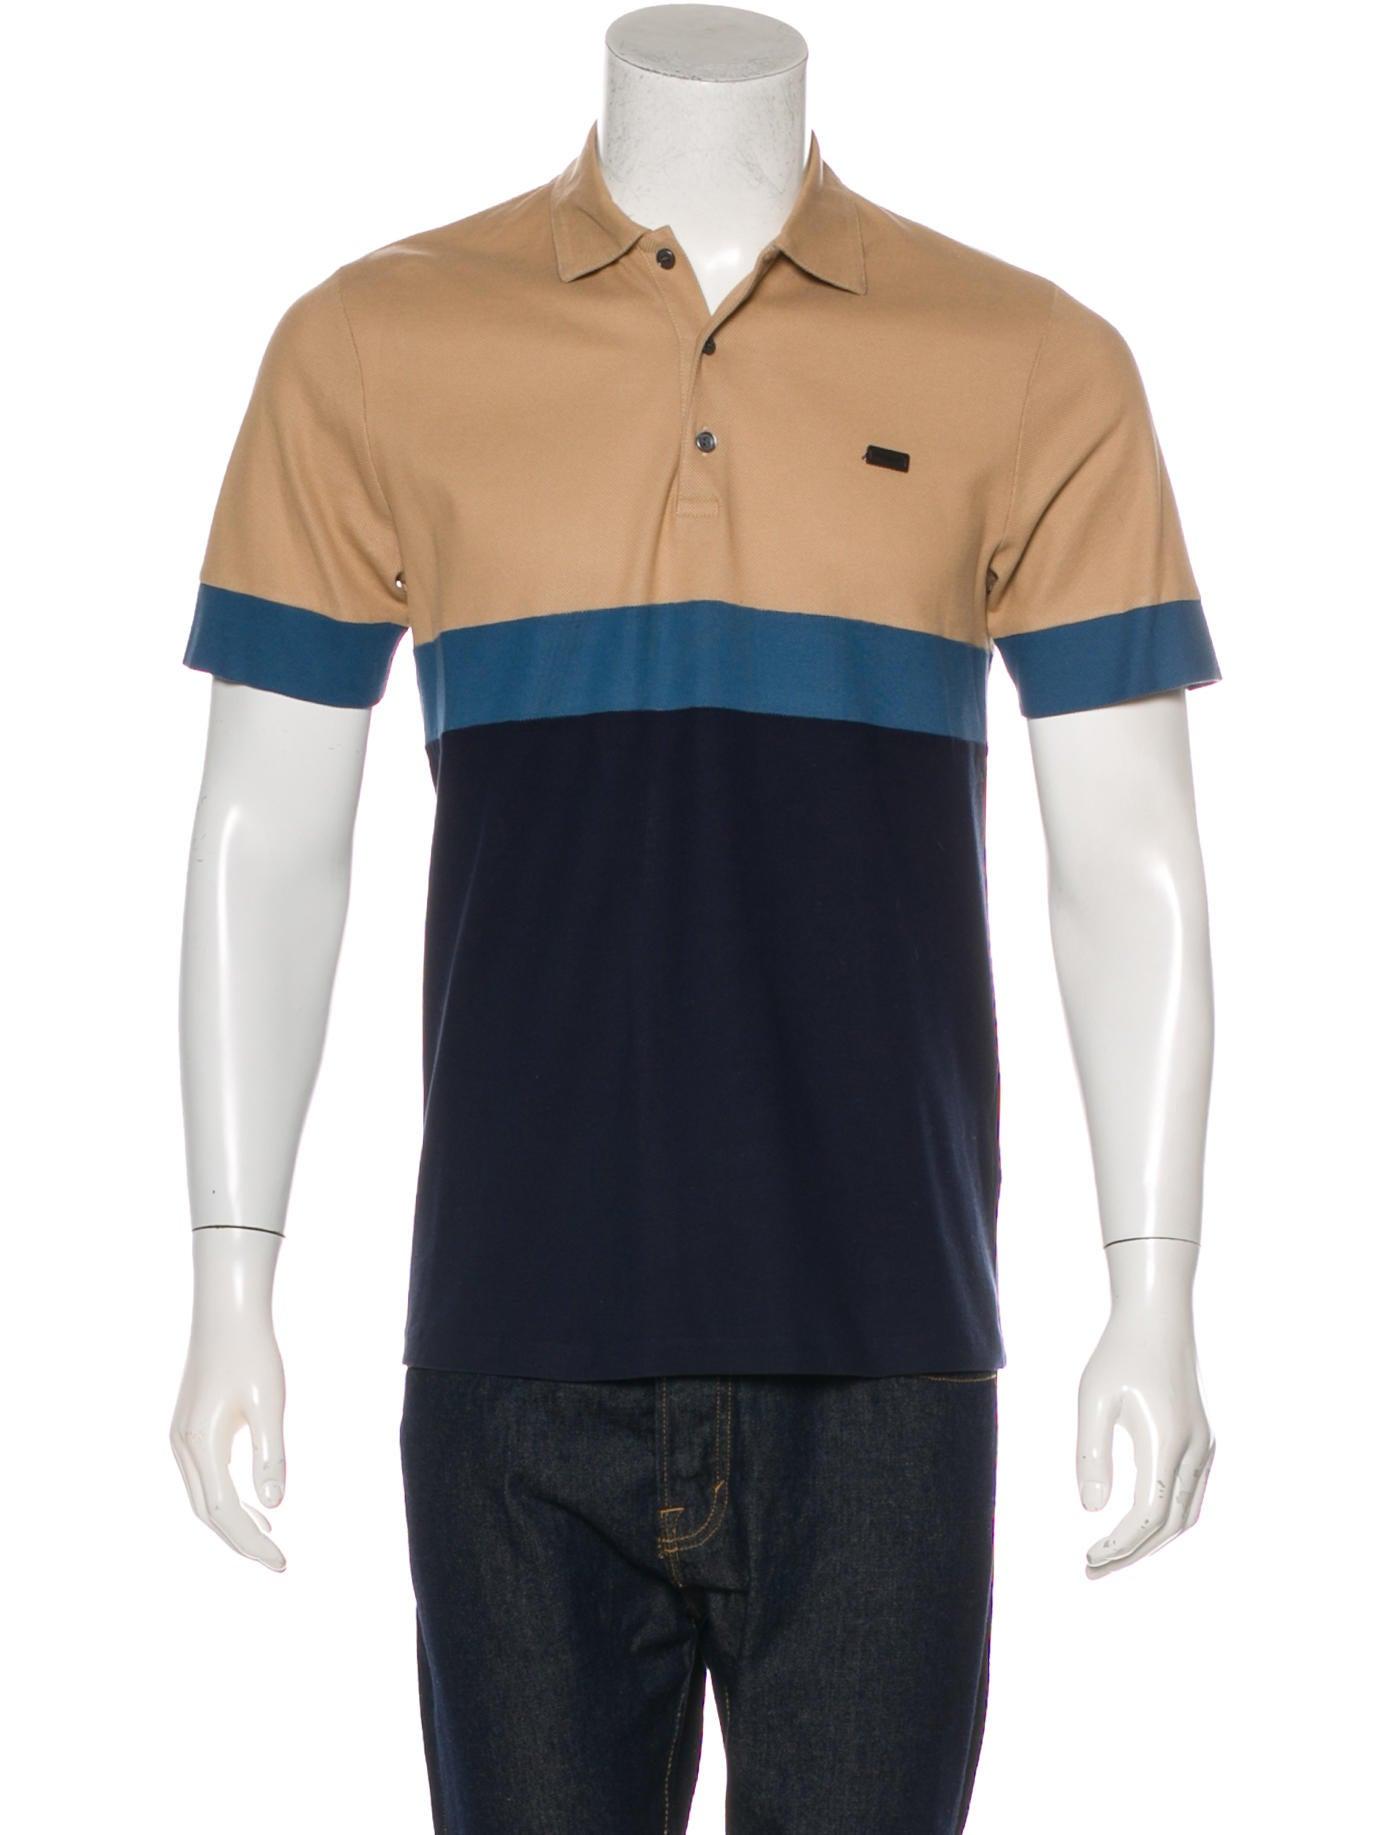 Burberry London Striped Polo Shirt Clothing Wburl33239 The